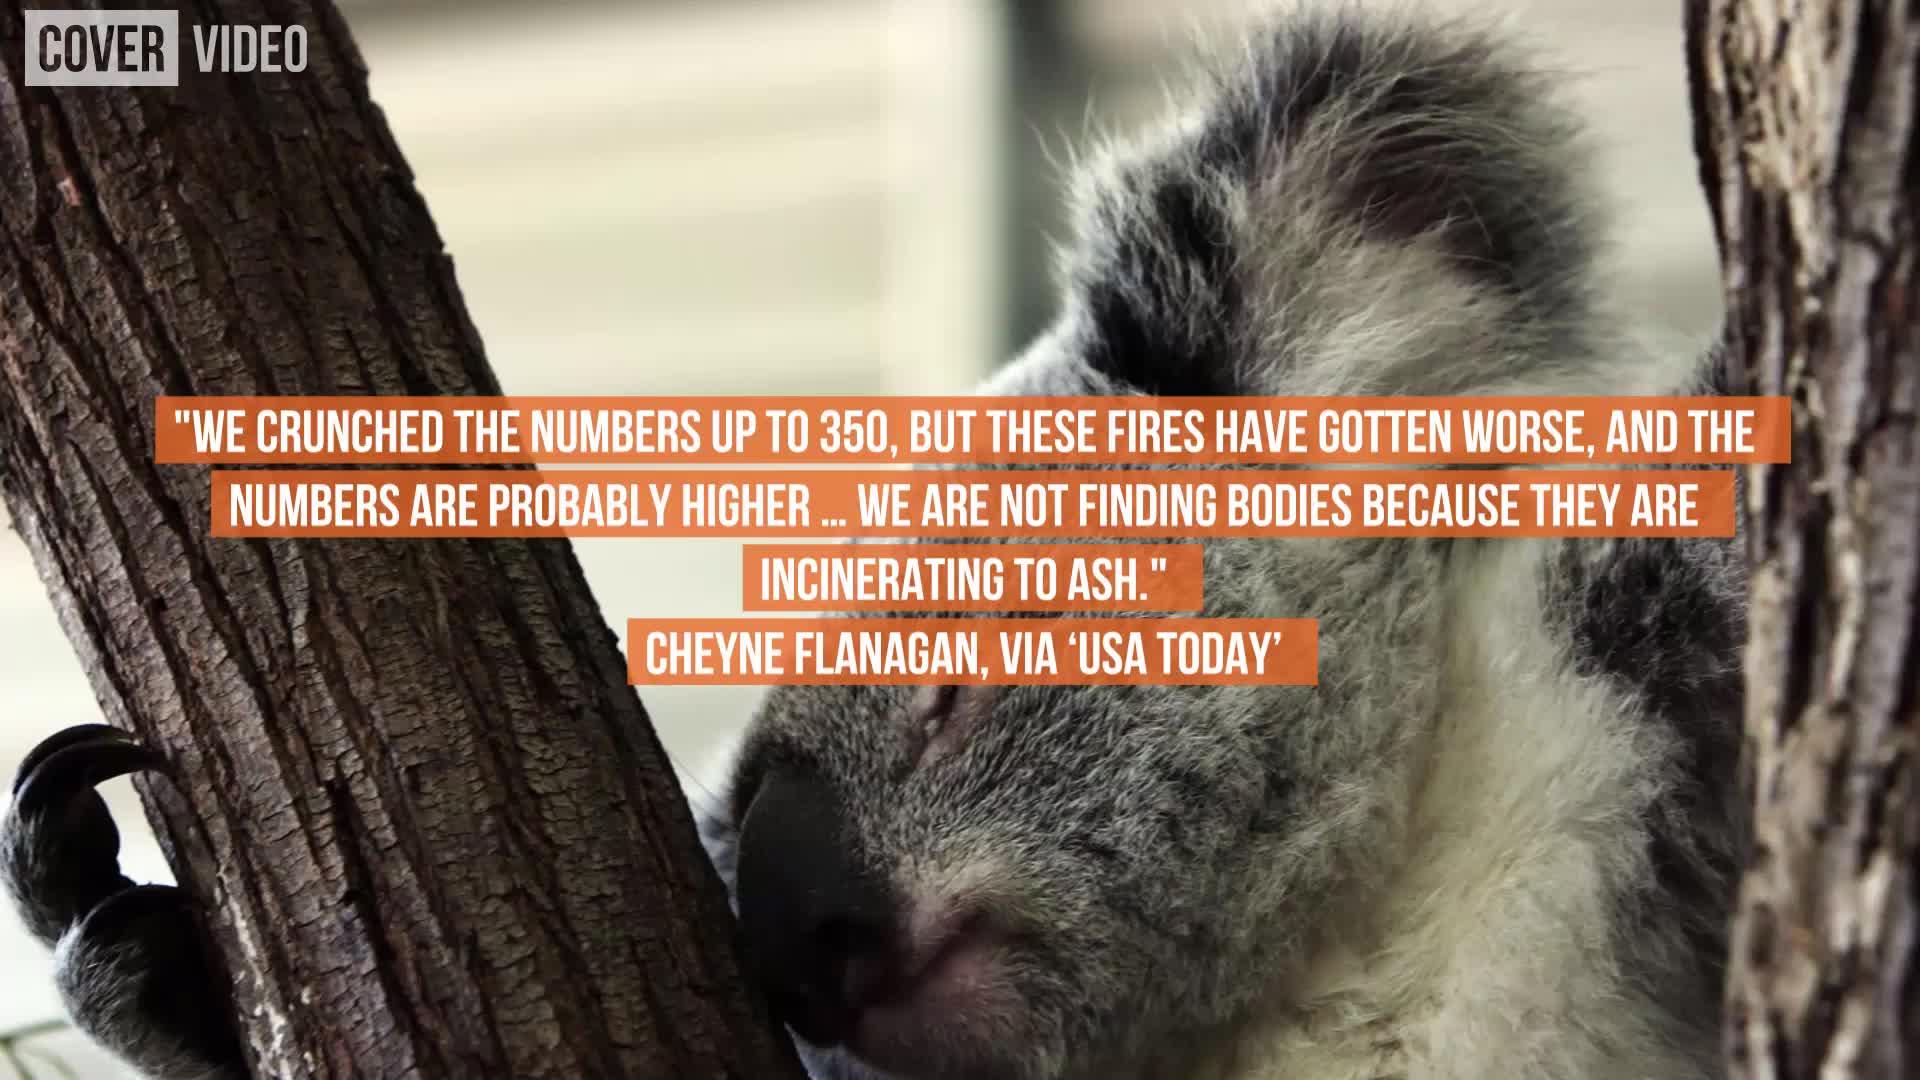 Koala Colonies Decimated by Wildfires in Australia